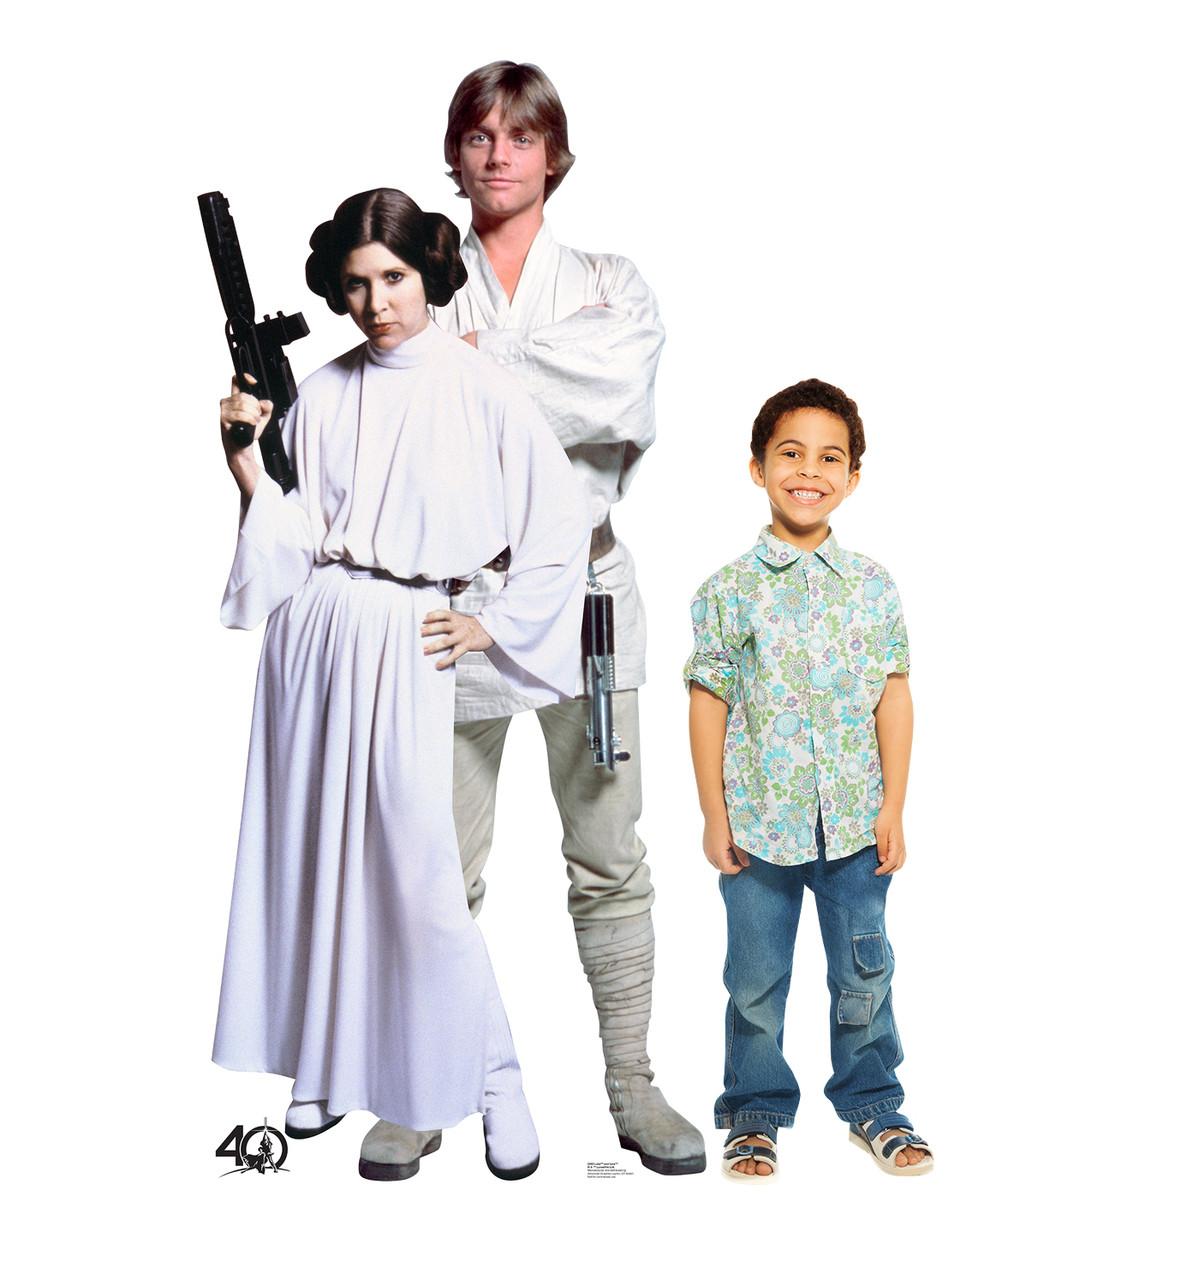 Life-size Luke and Leia  (Star Wars 40th) Cardboard Standup | Cardboard Cutout 2